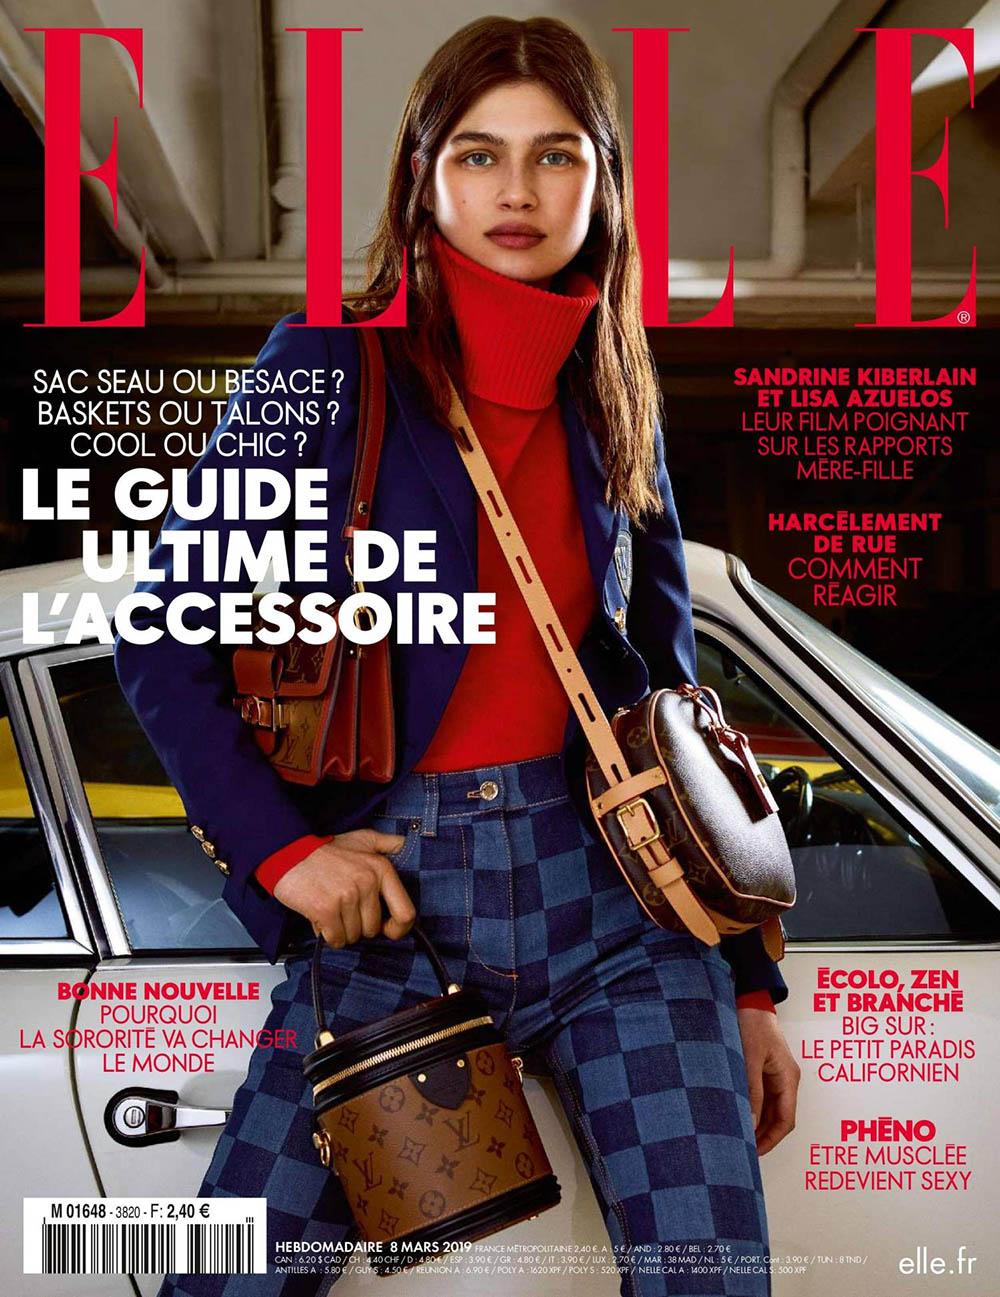 Nastya Zakharova covers Elle France March 8th, 2019 by Nik Hartley